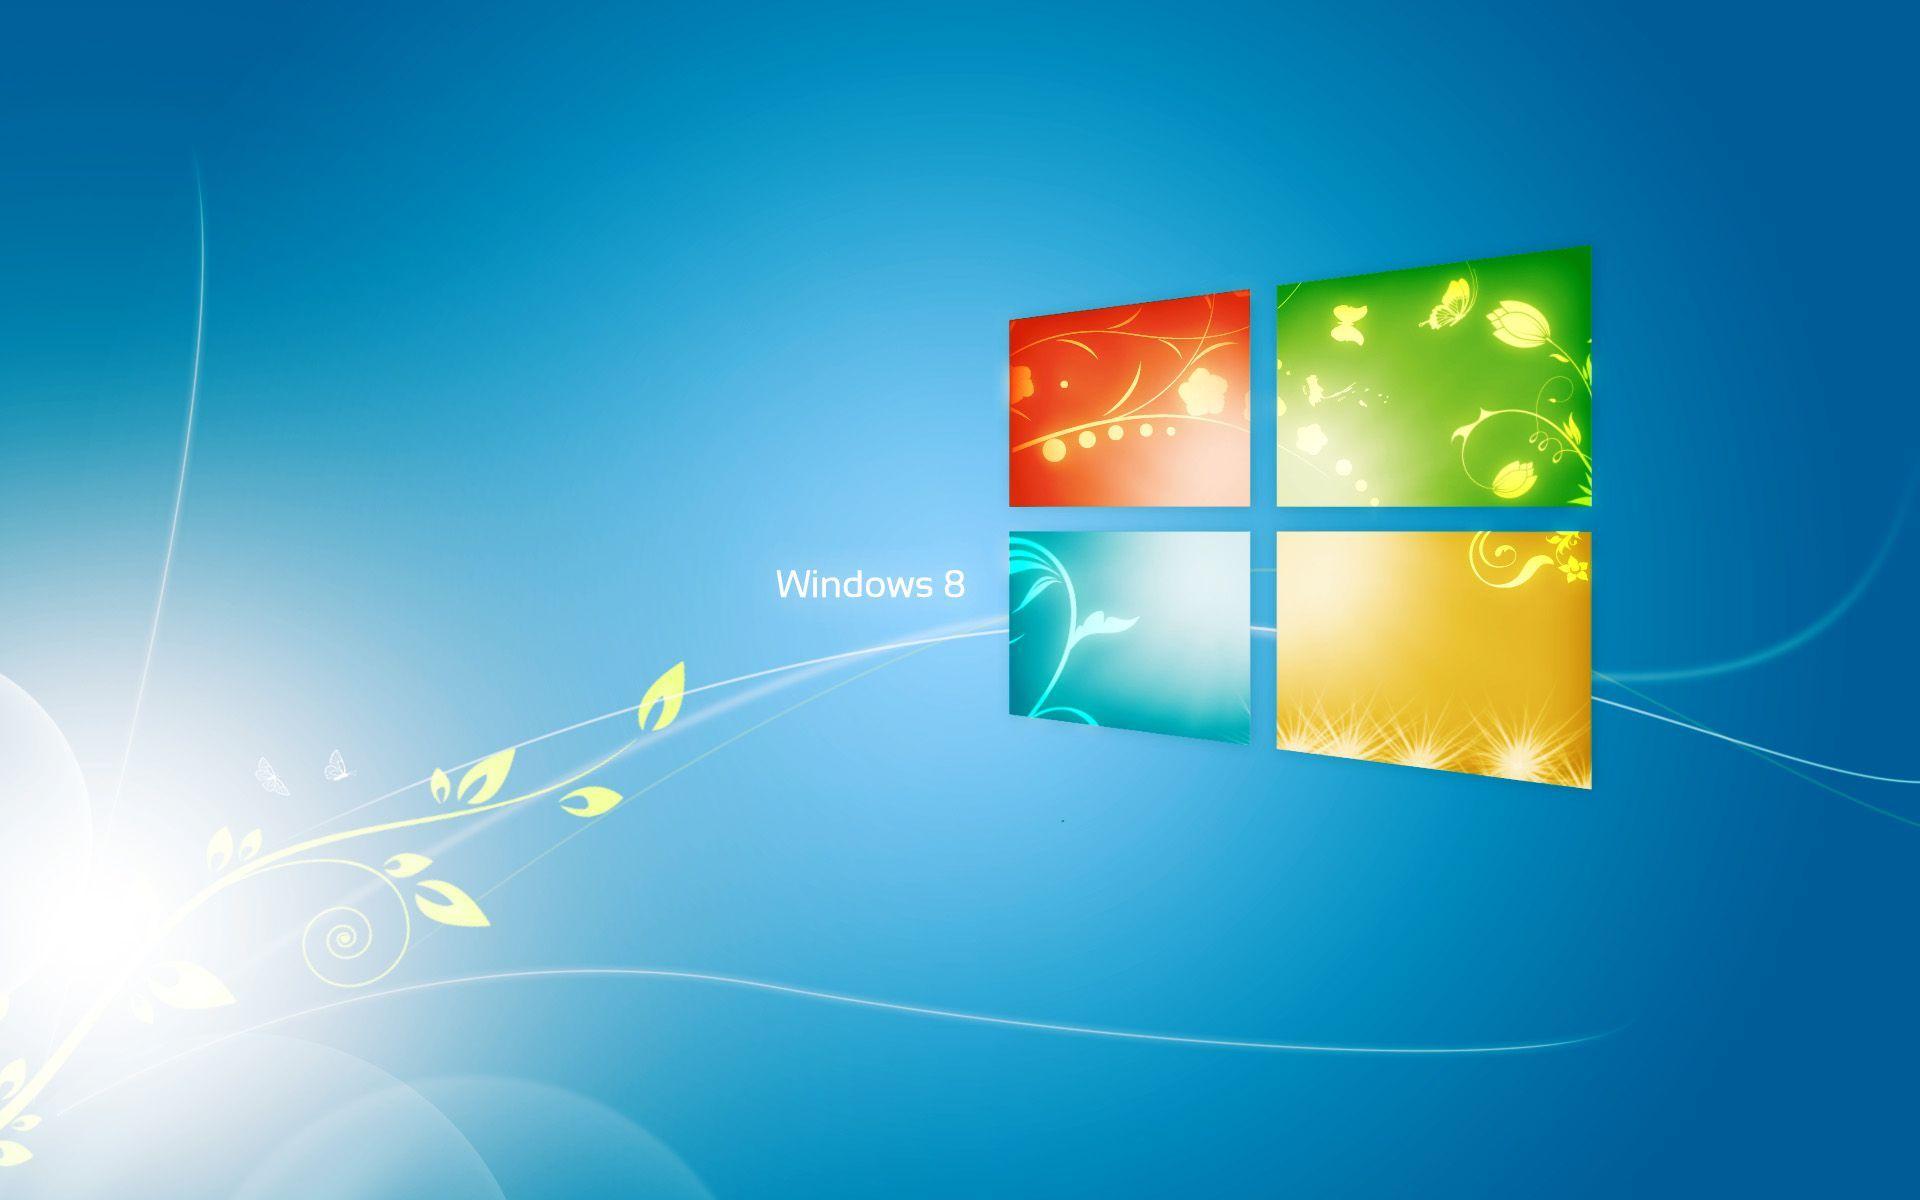 Windows 8 Wallpapers 02